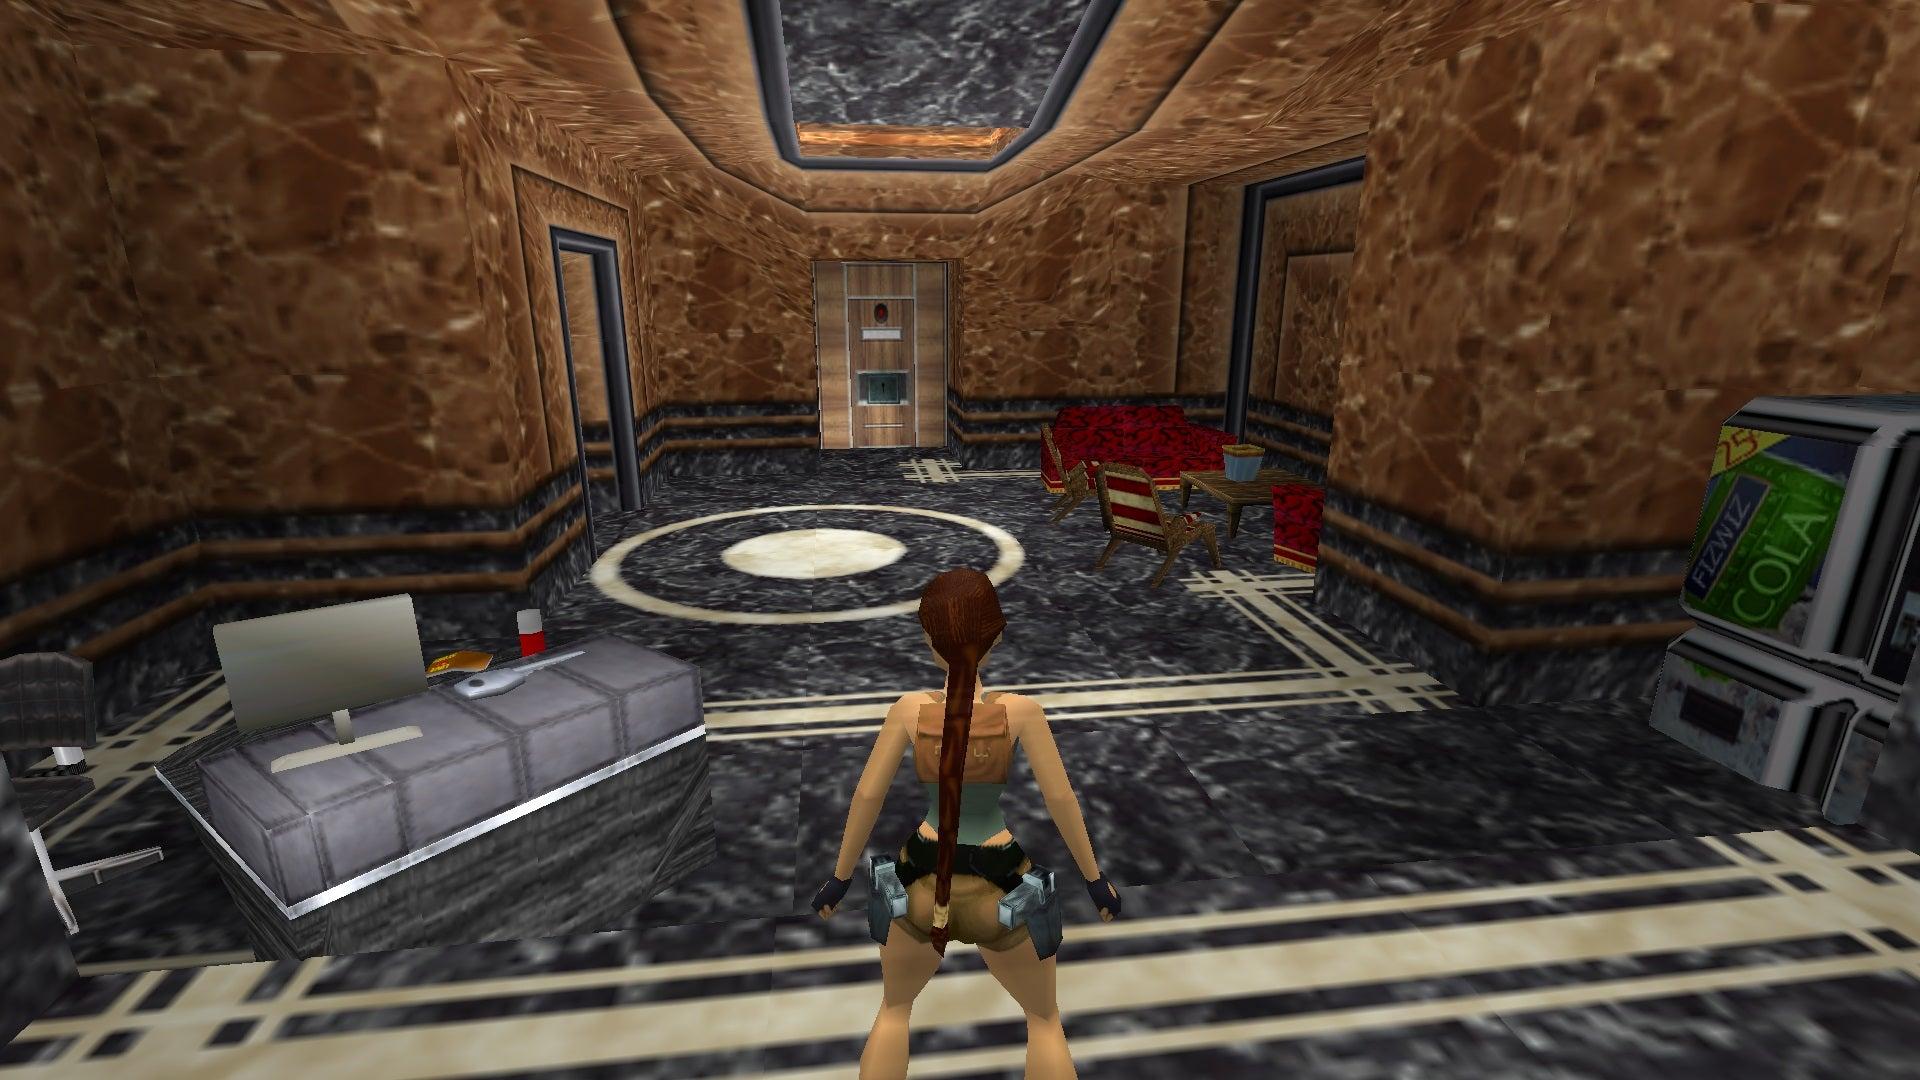 A screenshot from the Tomb Raider custom level called V.C.S.L.2